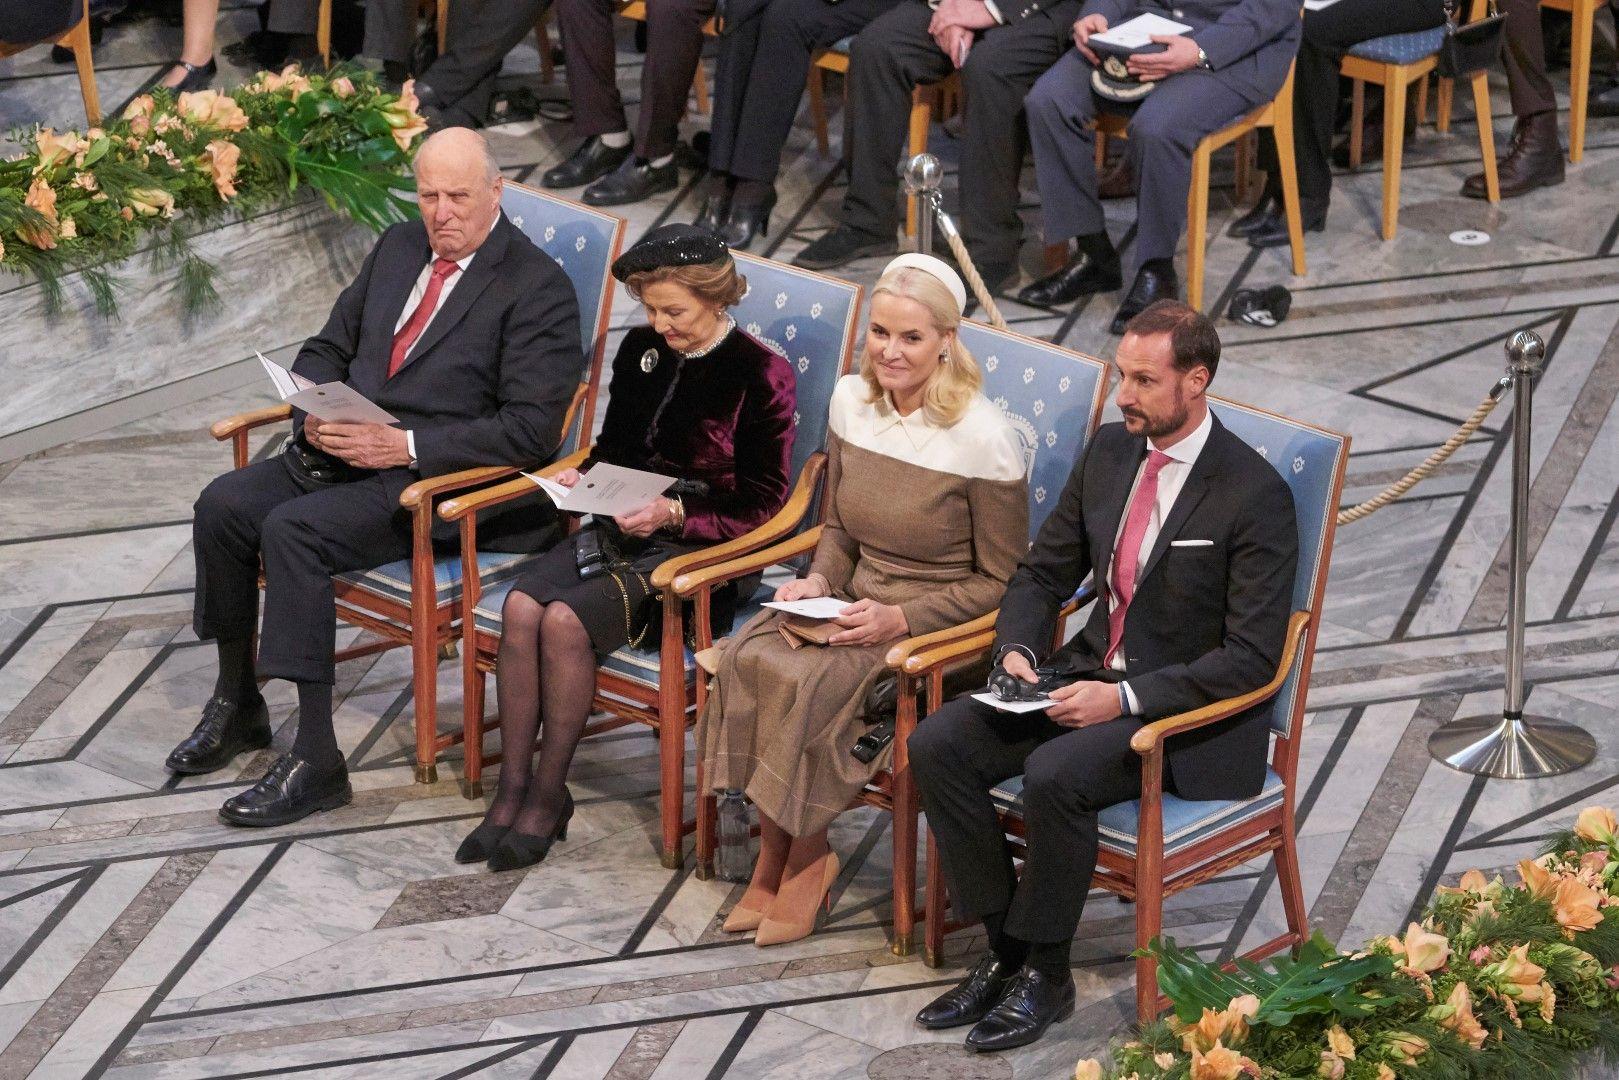 Крал Хералд, кралица Соня, принцеса Мете-Марит и принц Хаакон